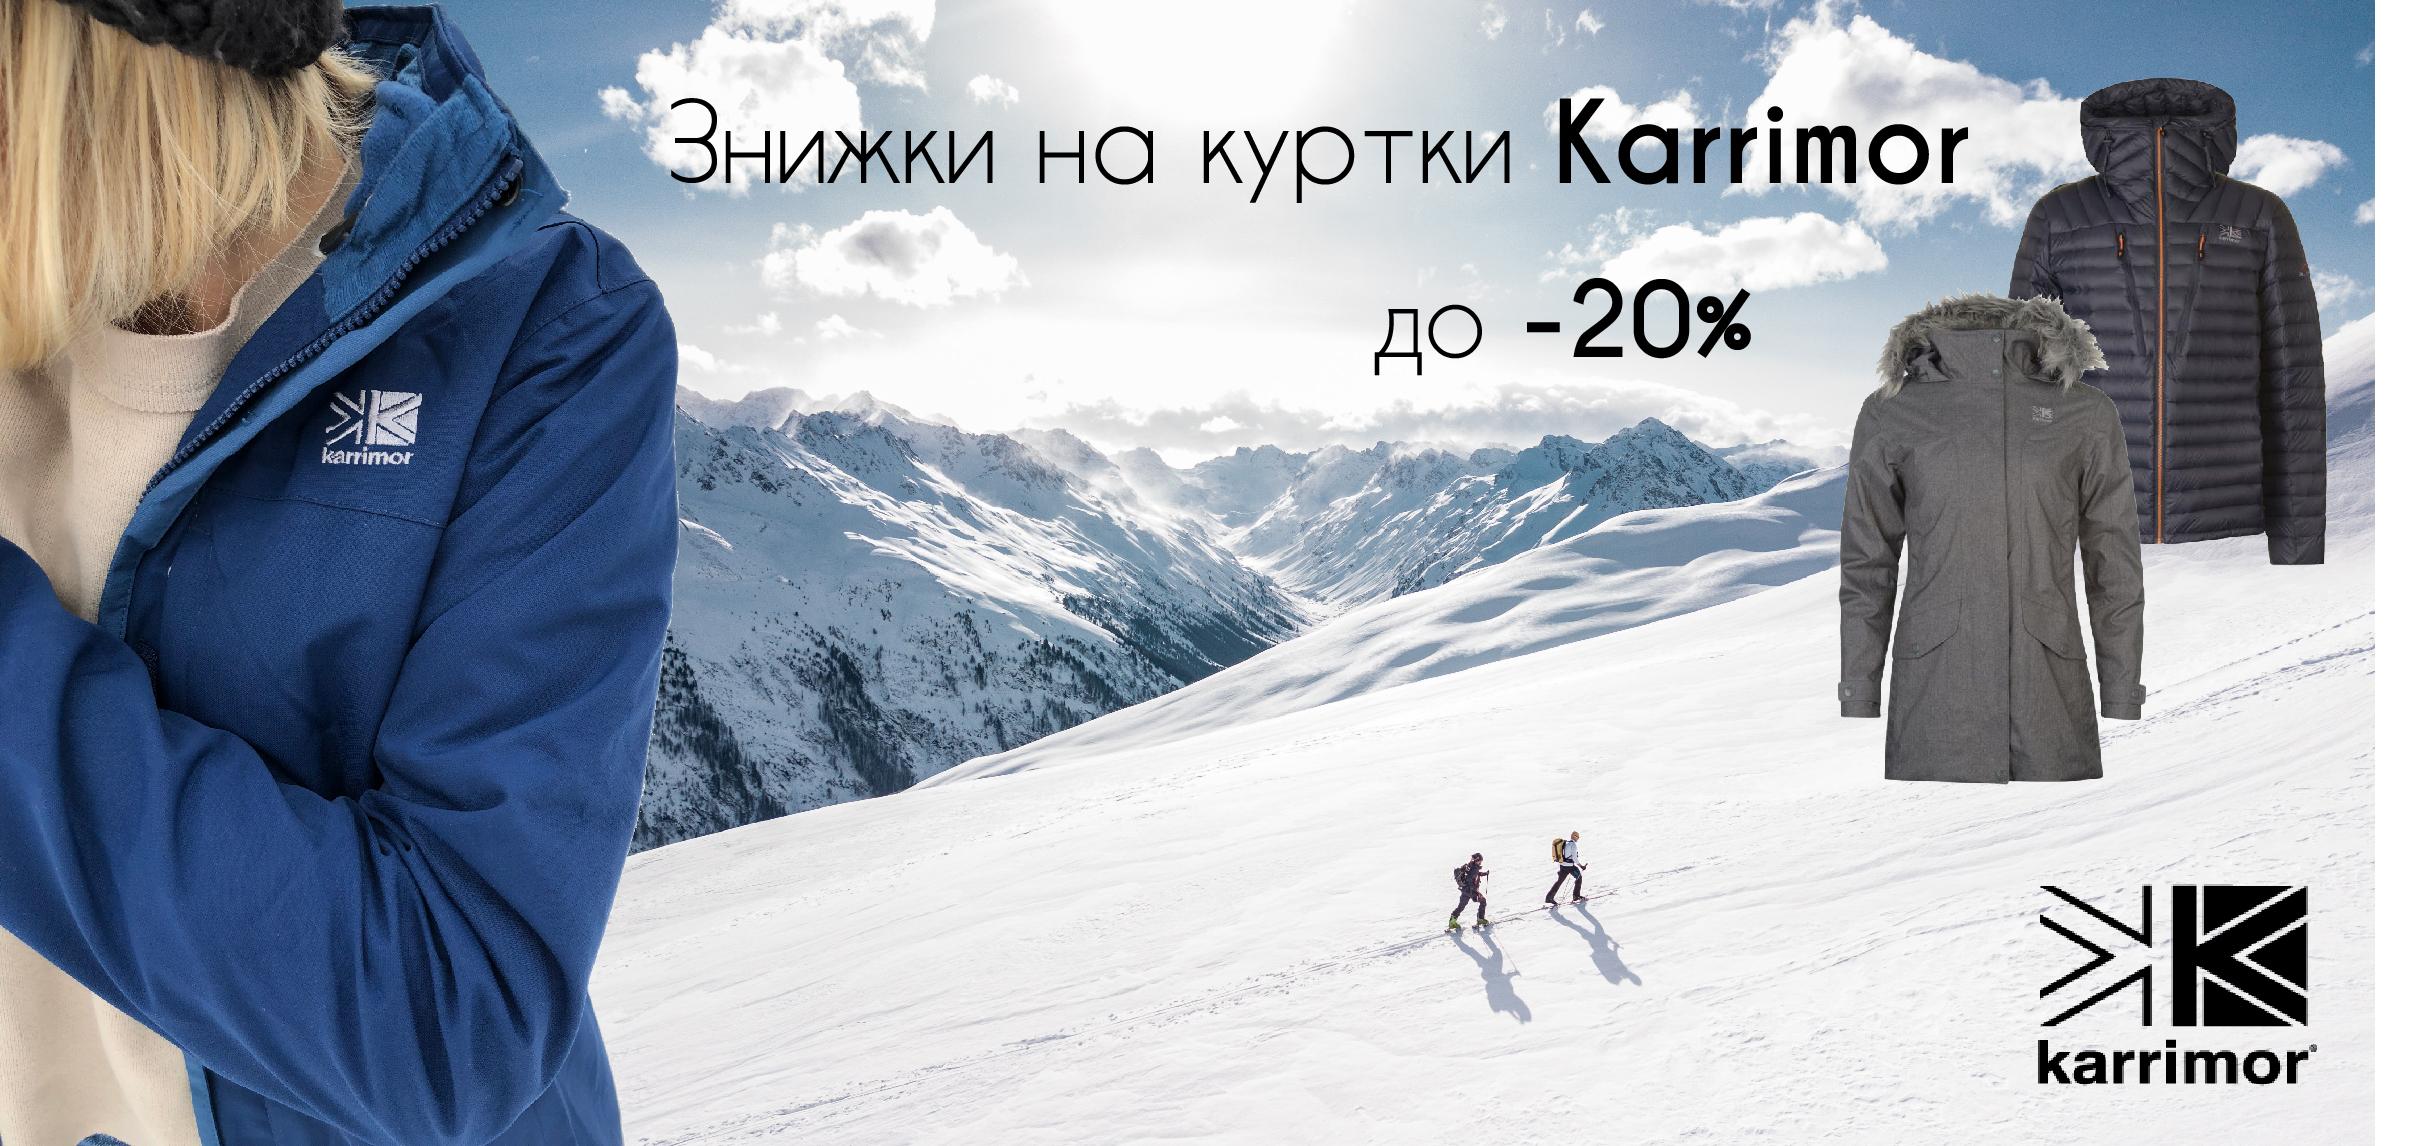 karrimor_winter_sale_ukr